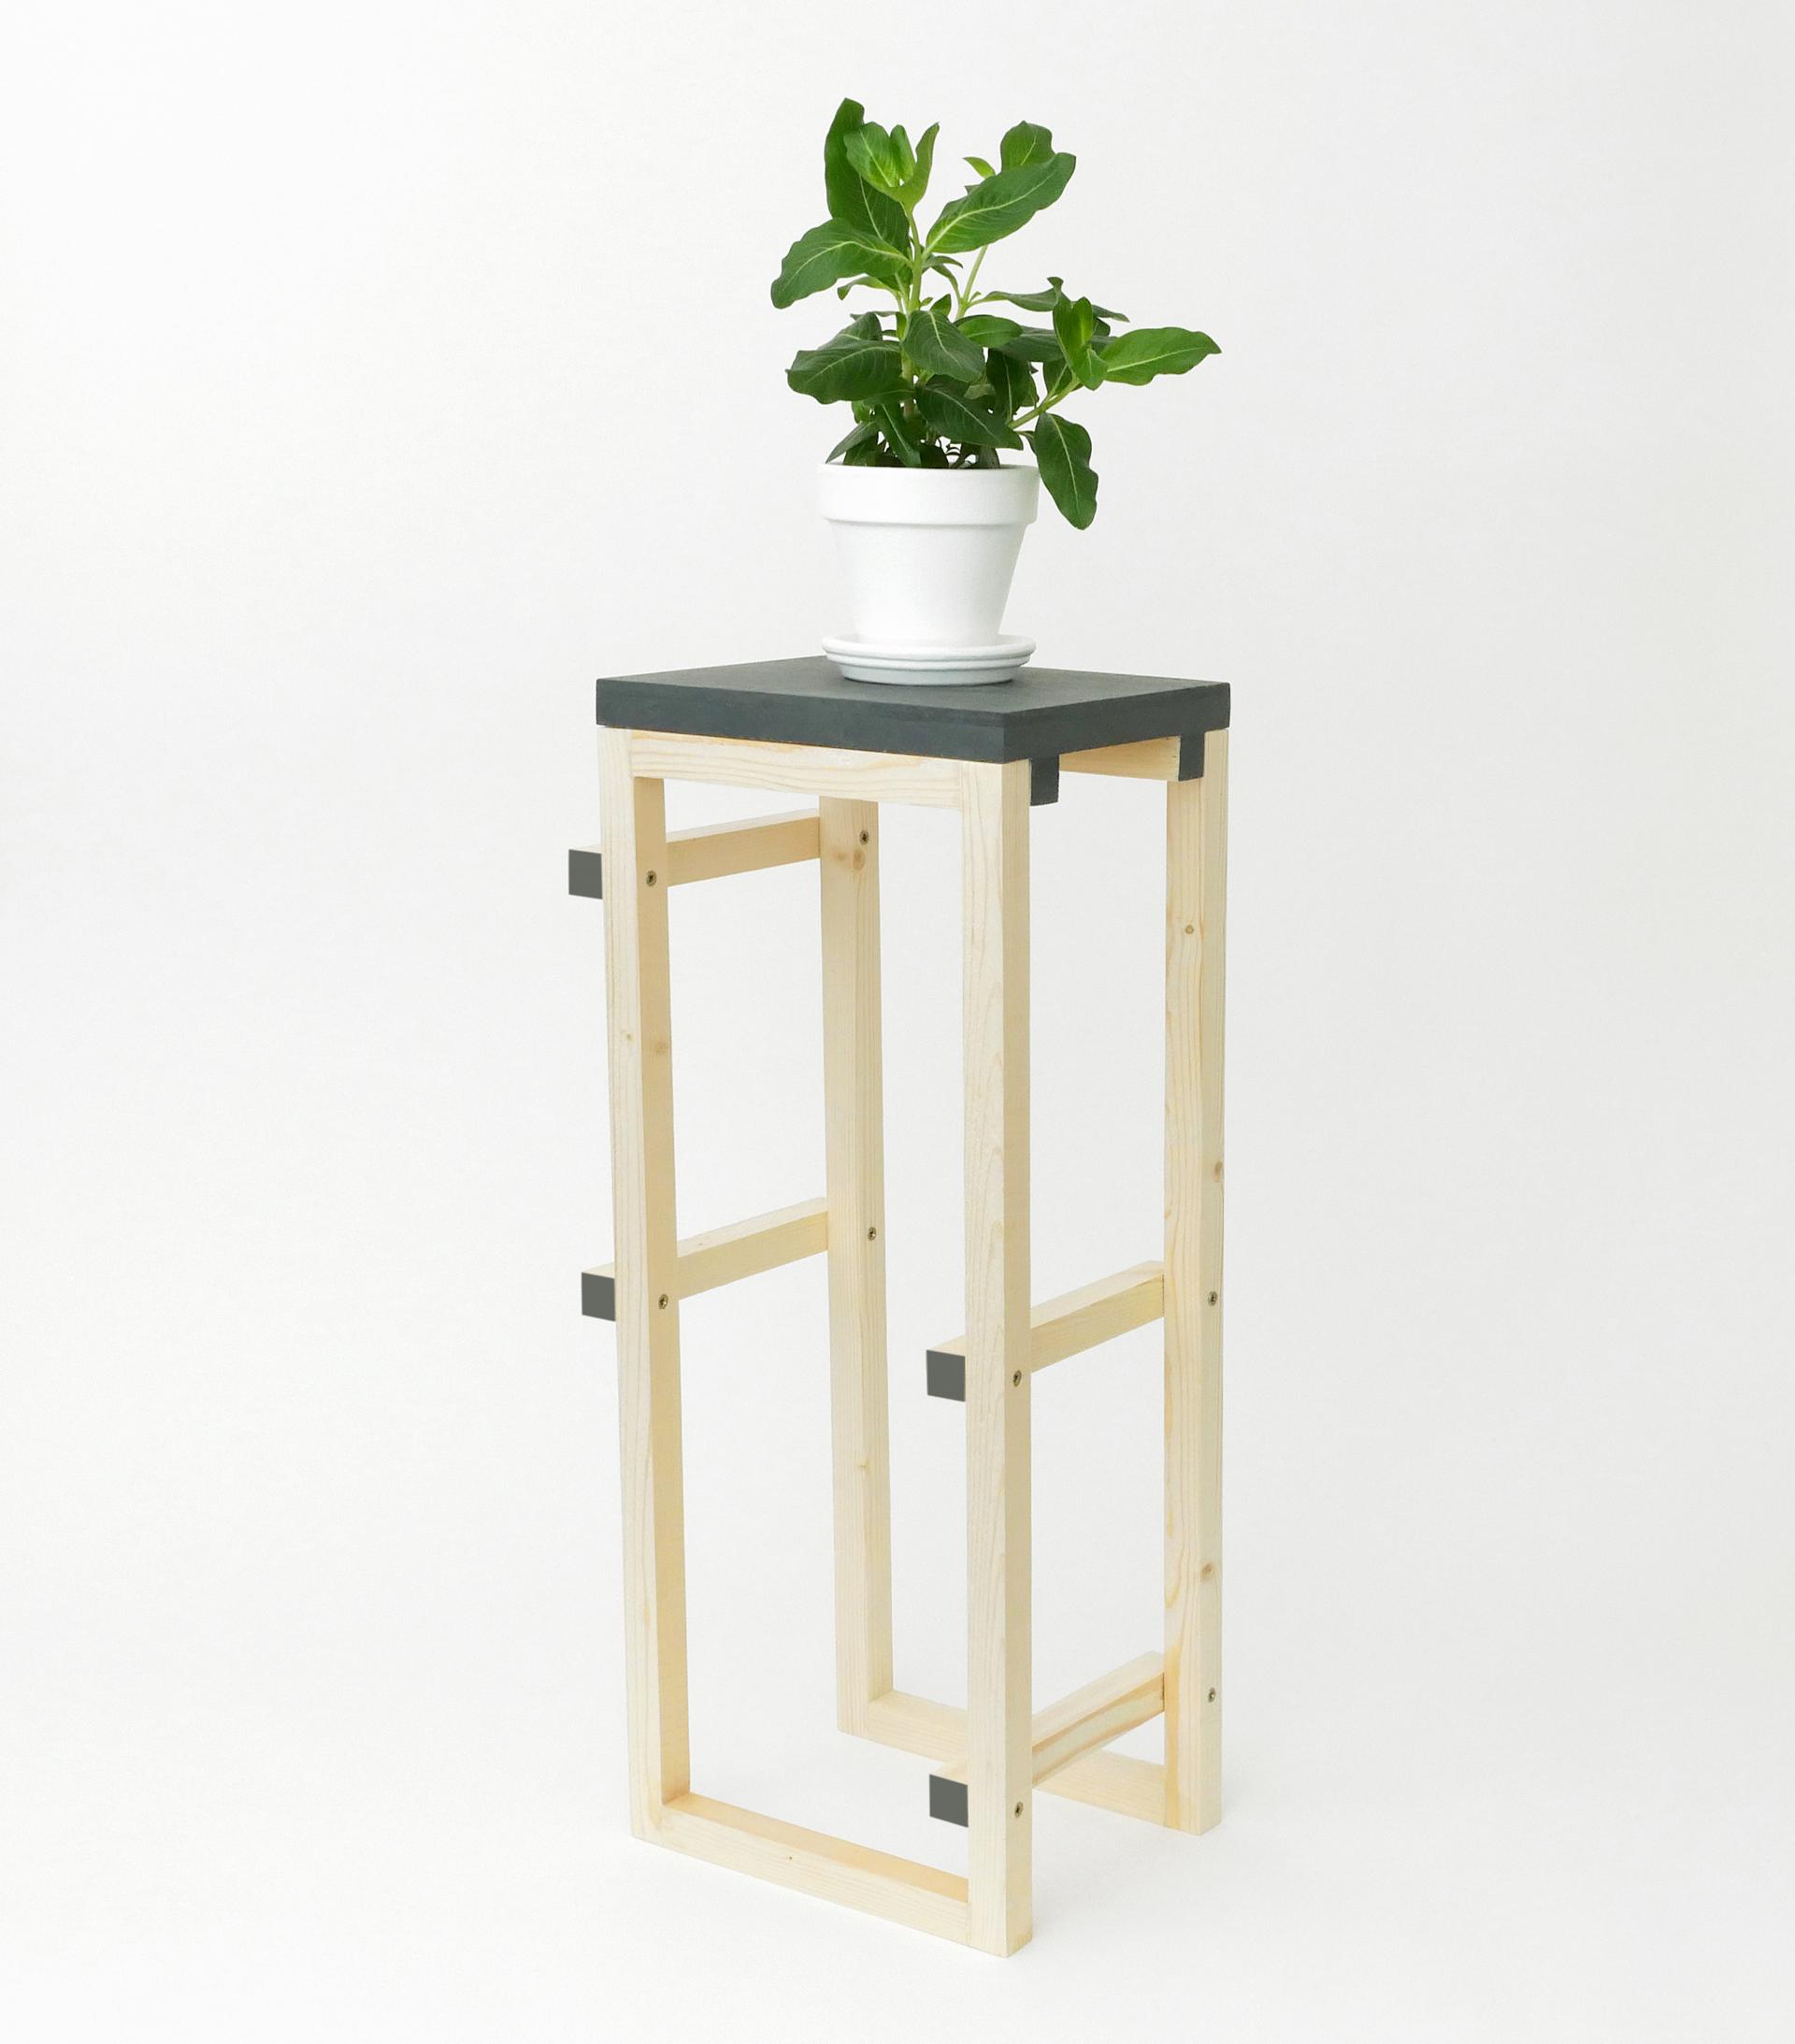 meuble plantes paris design week pierre lota. Black Bedroom Furniture Sets. Home Design Ideas